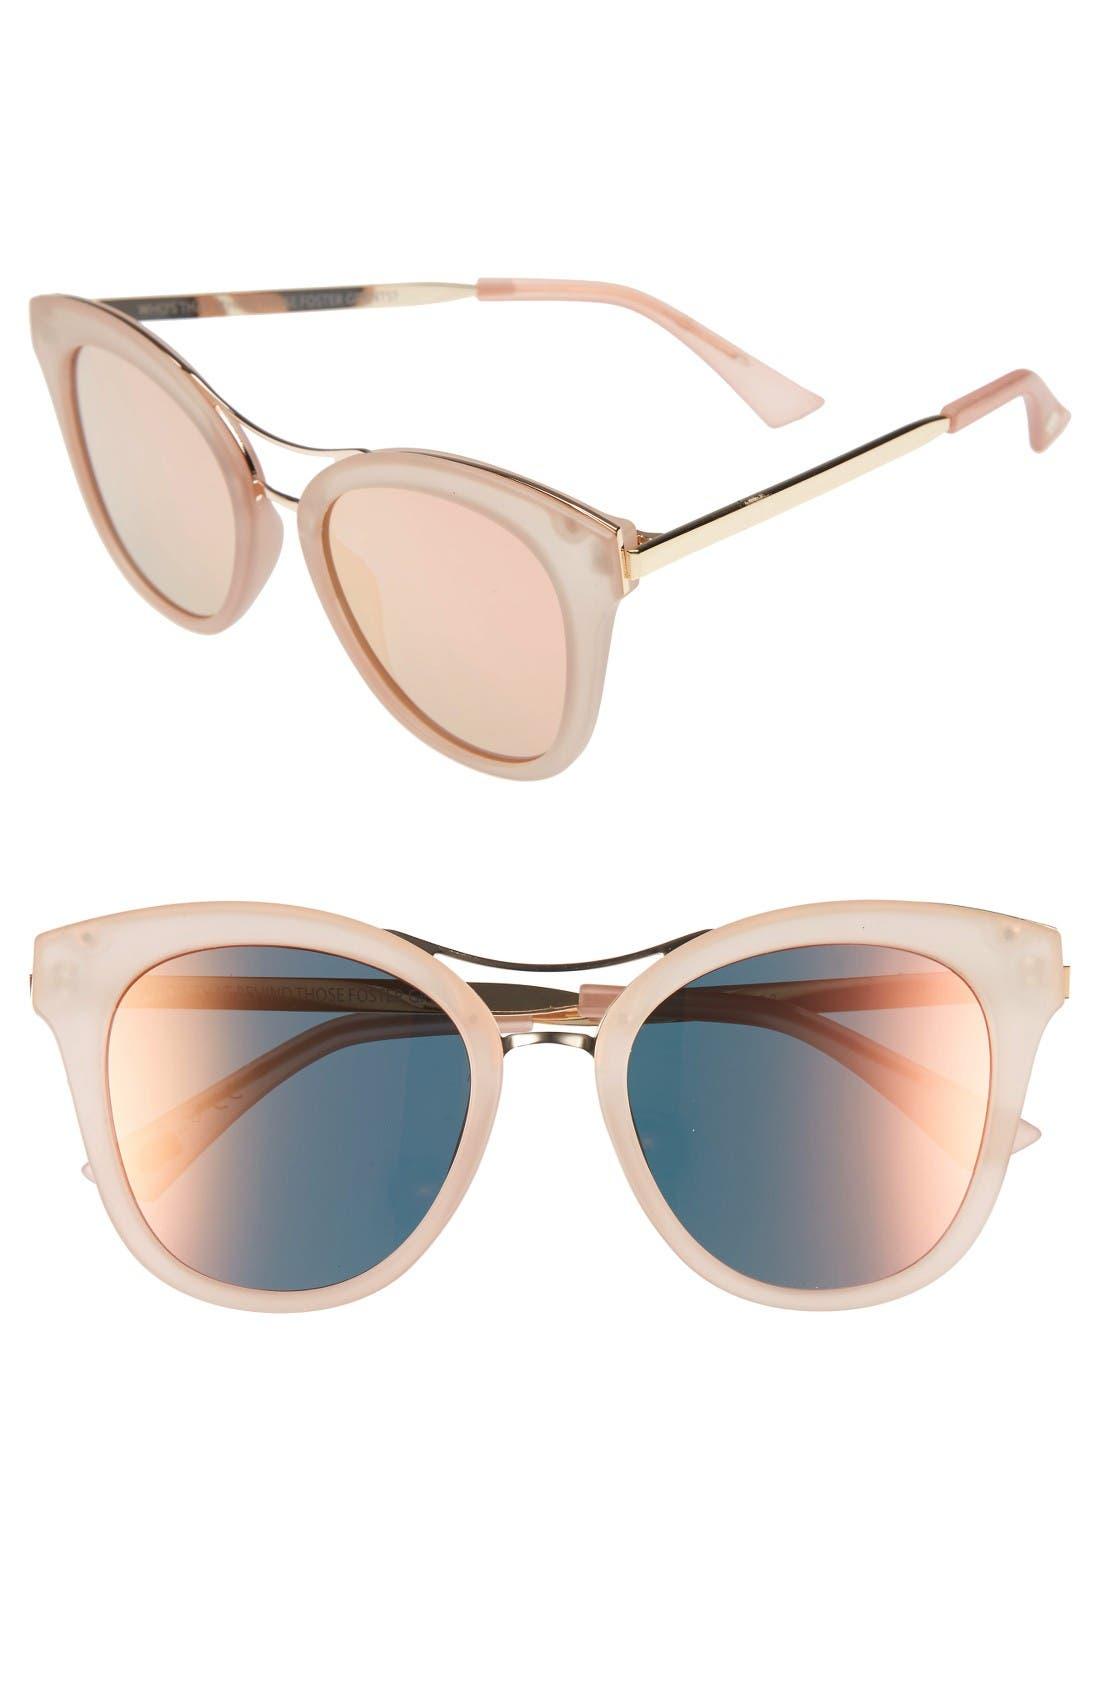 Alternate Image 1 Selected - Item 8 SP.3 51mm Sunglasses